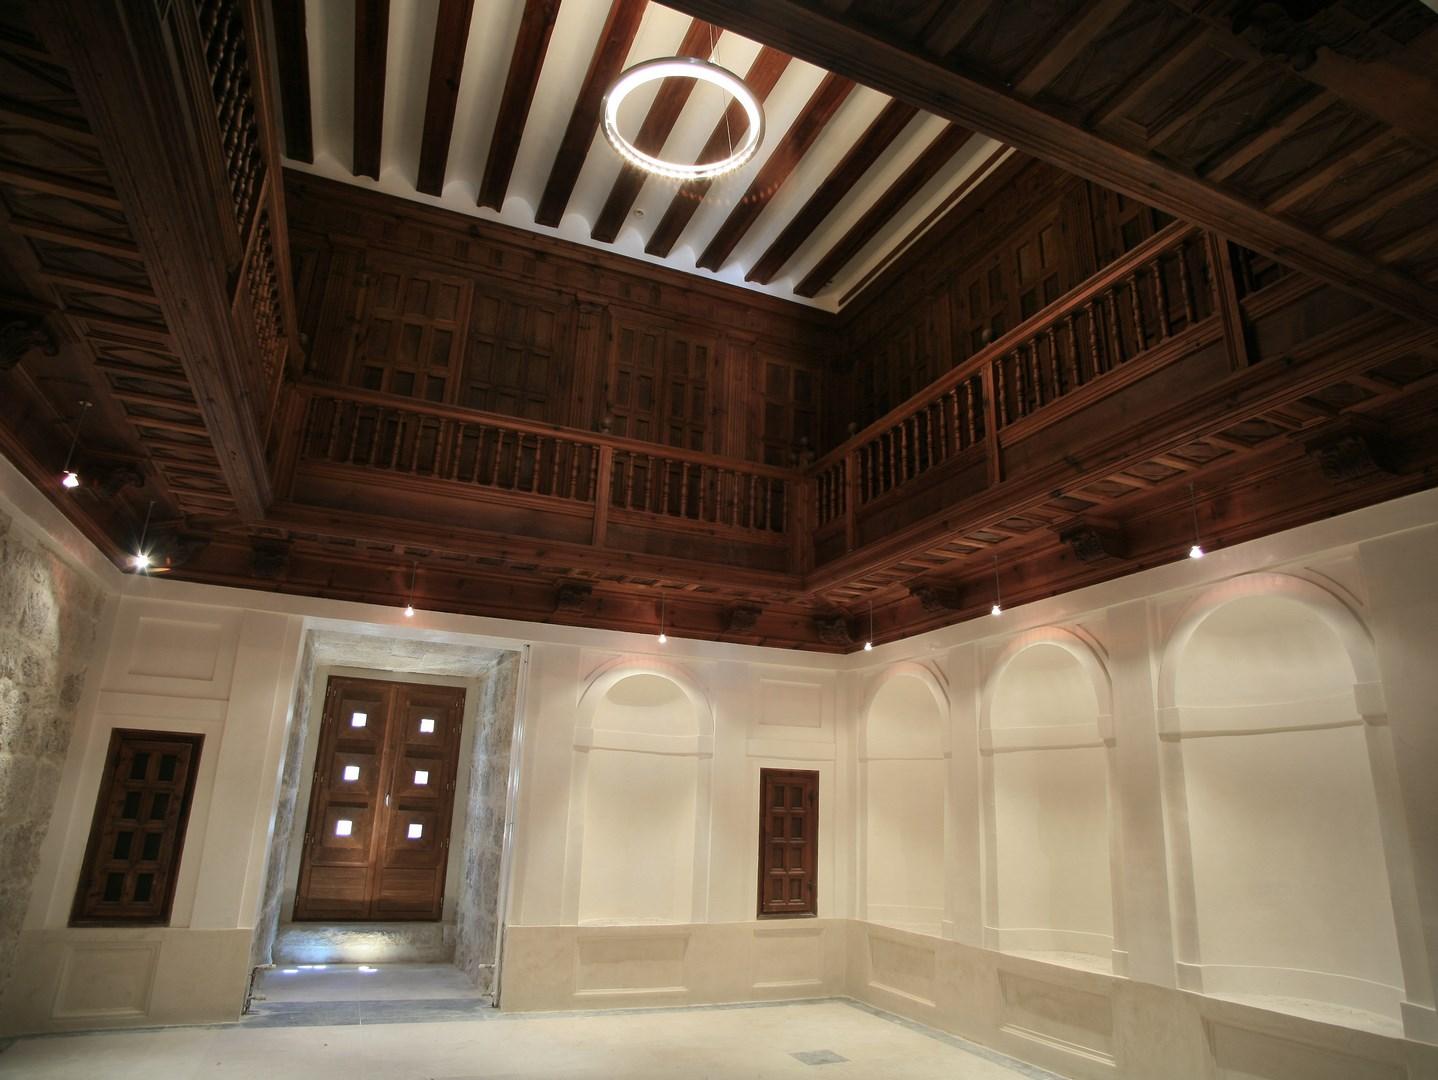 SIMANCAS sala interior artesonado